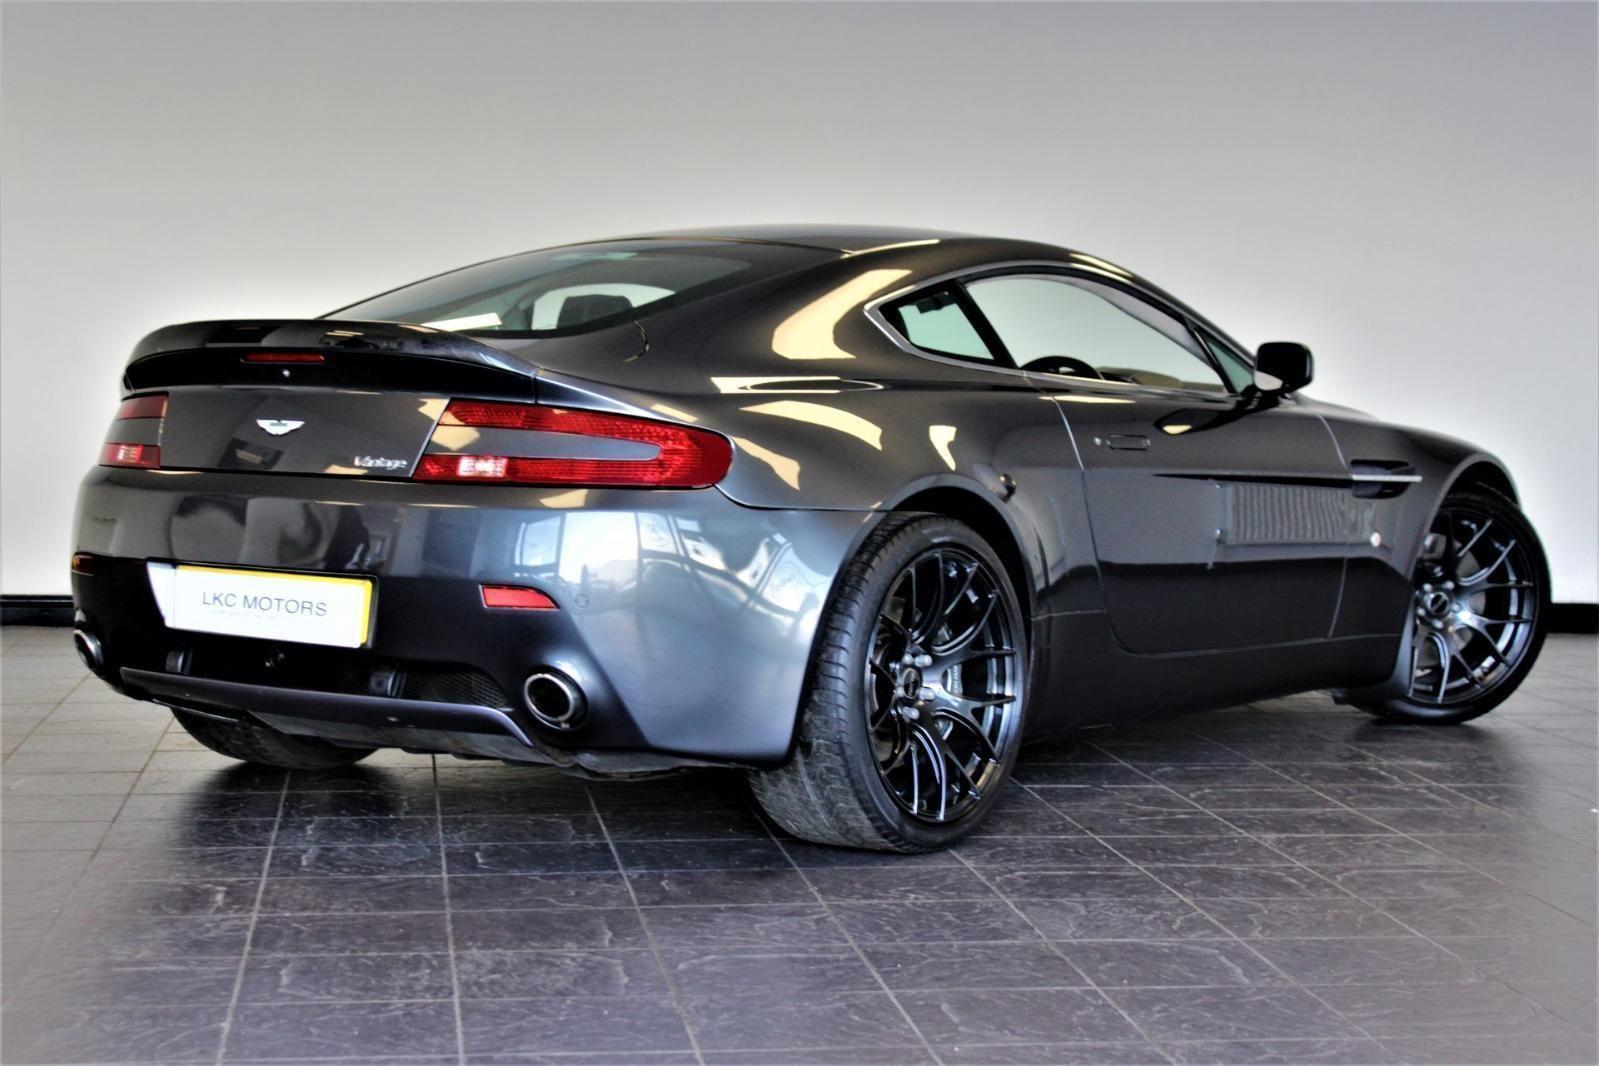 2008 Aston Martin Vantage V8 Coupe Petrol Ebay Aston Martin Aston Martin Vantage Aston